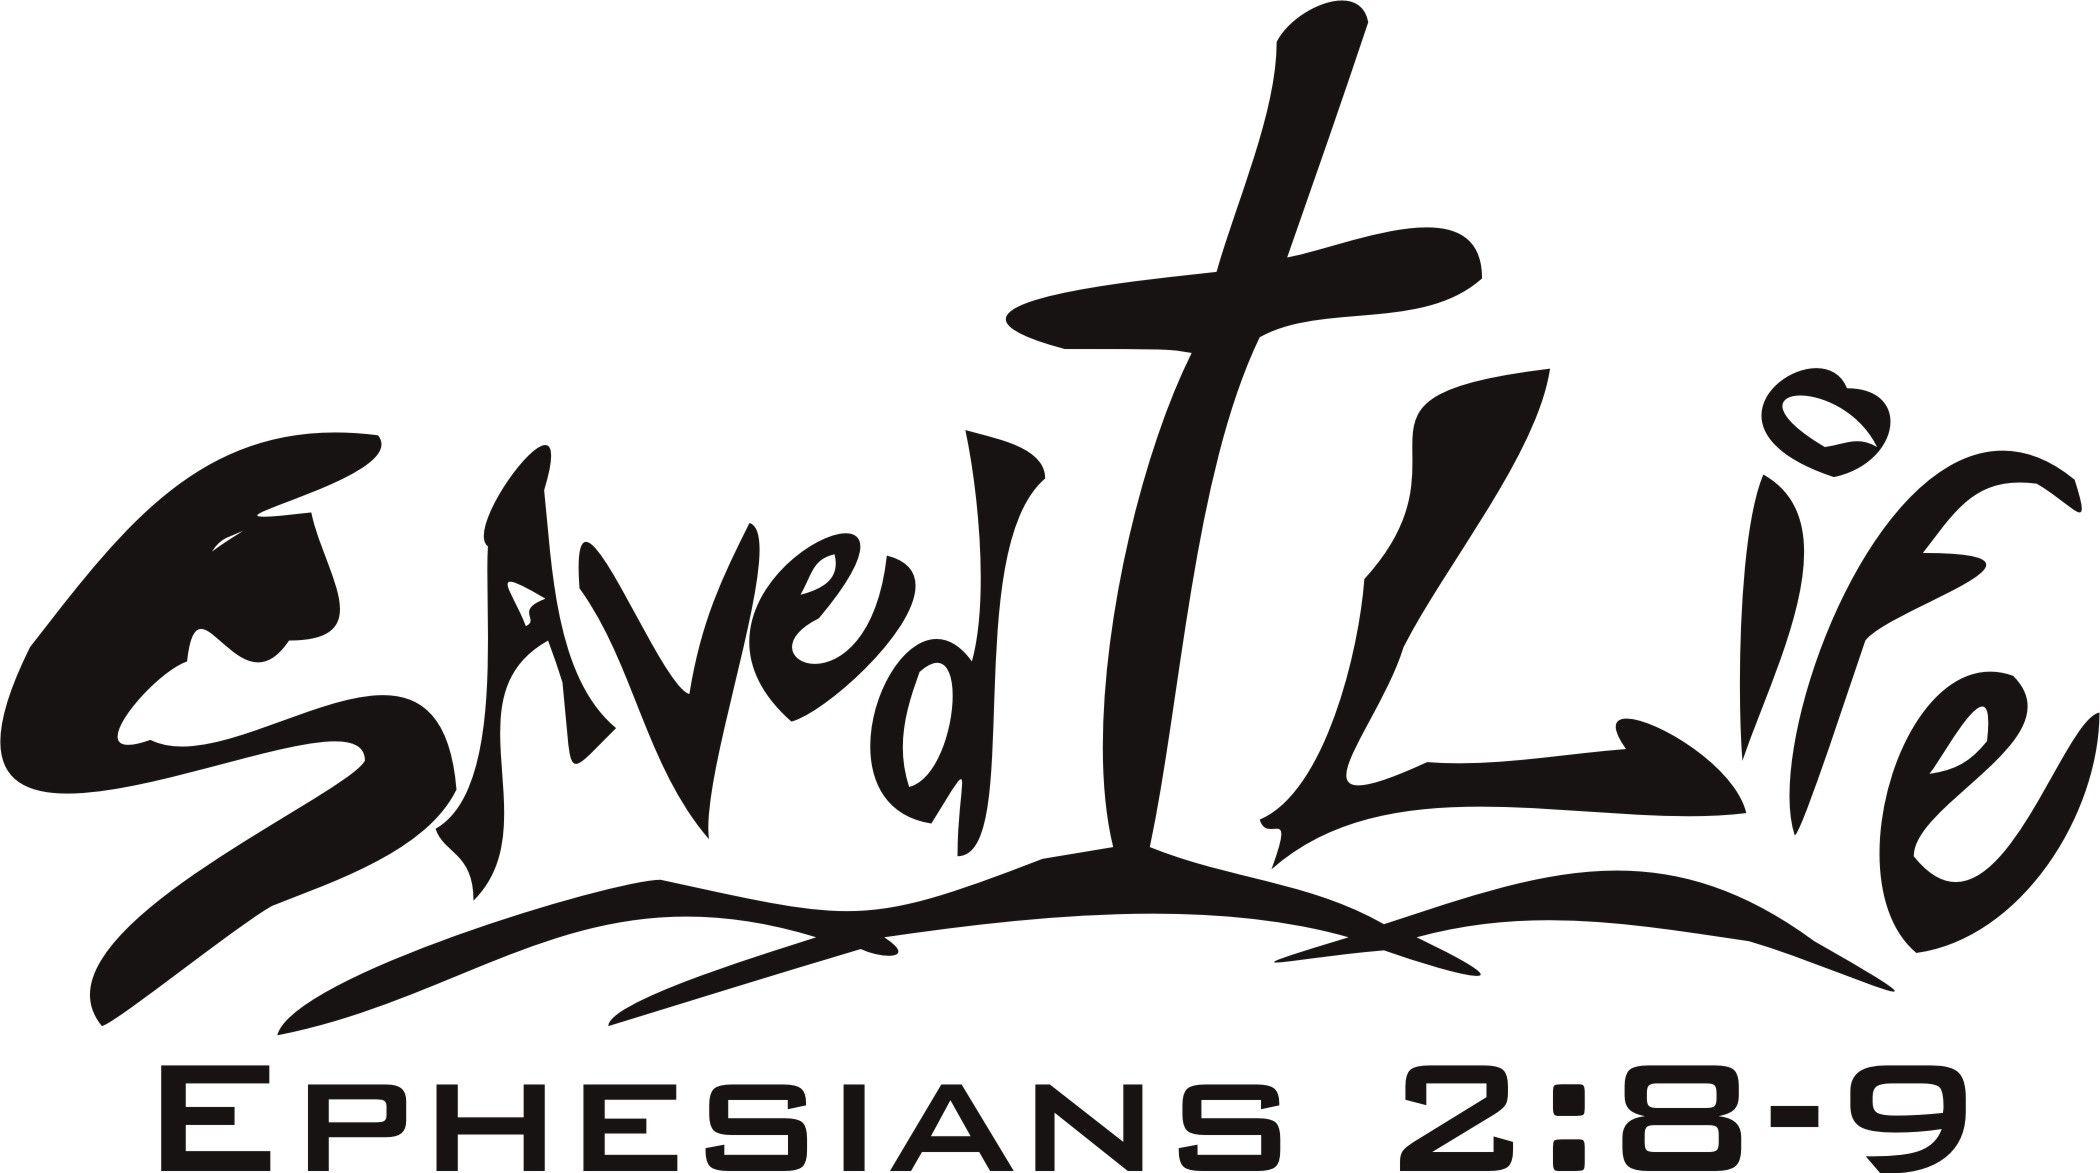 Saved Life Christian Vinyl Decal Christian Car Decals Window Stickers Christian Decals Vinyl Decals [ 1173 x 2100 Pixel ]